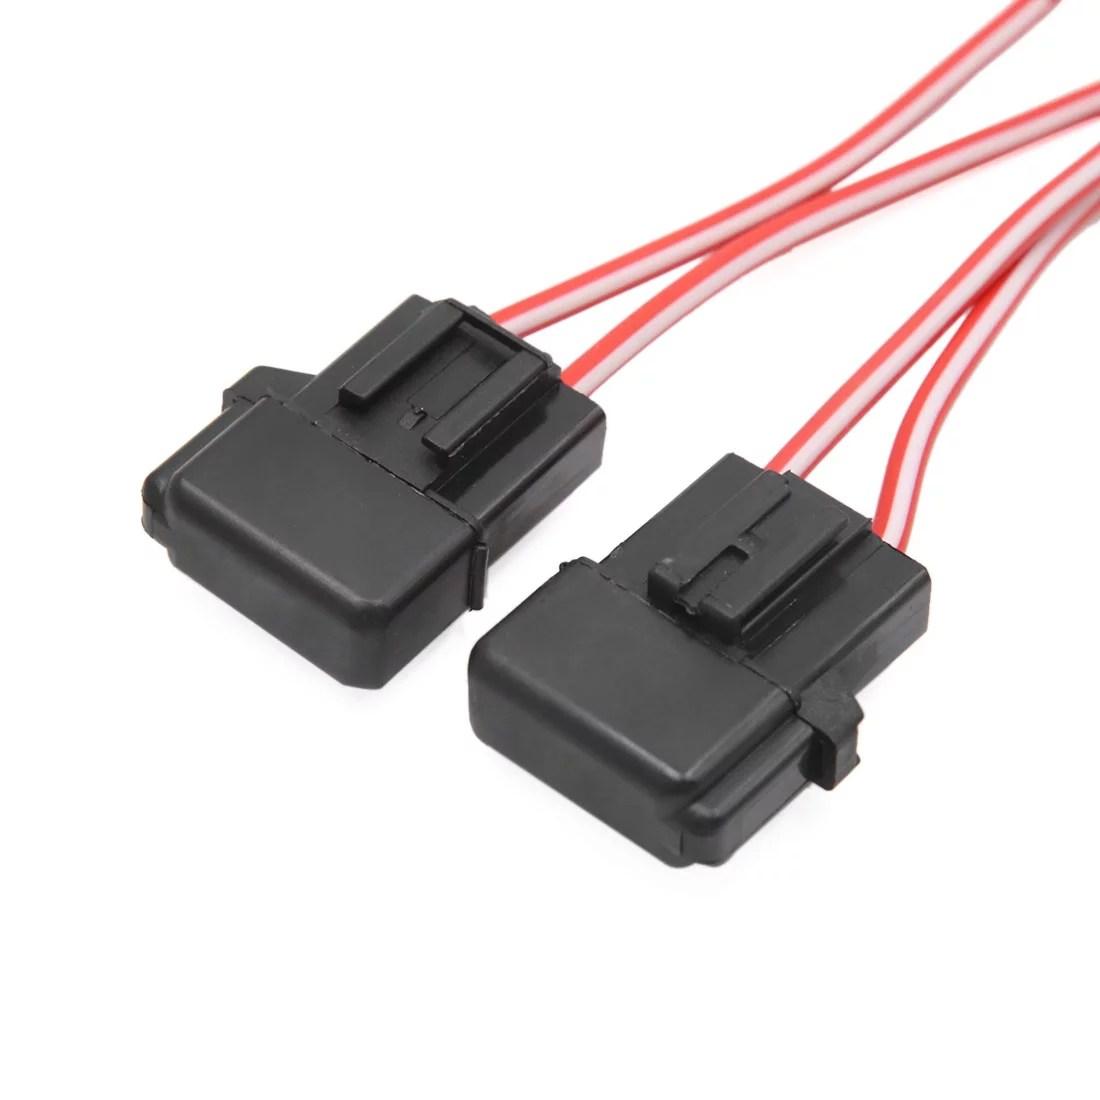 medium resolution of 2pcs black plastic square shell cap wiring harness fuse holder for car vehicle walmart canada